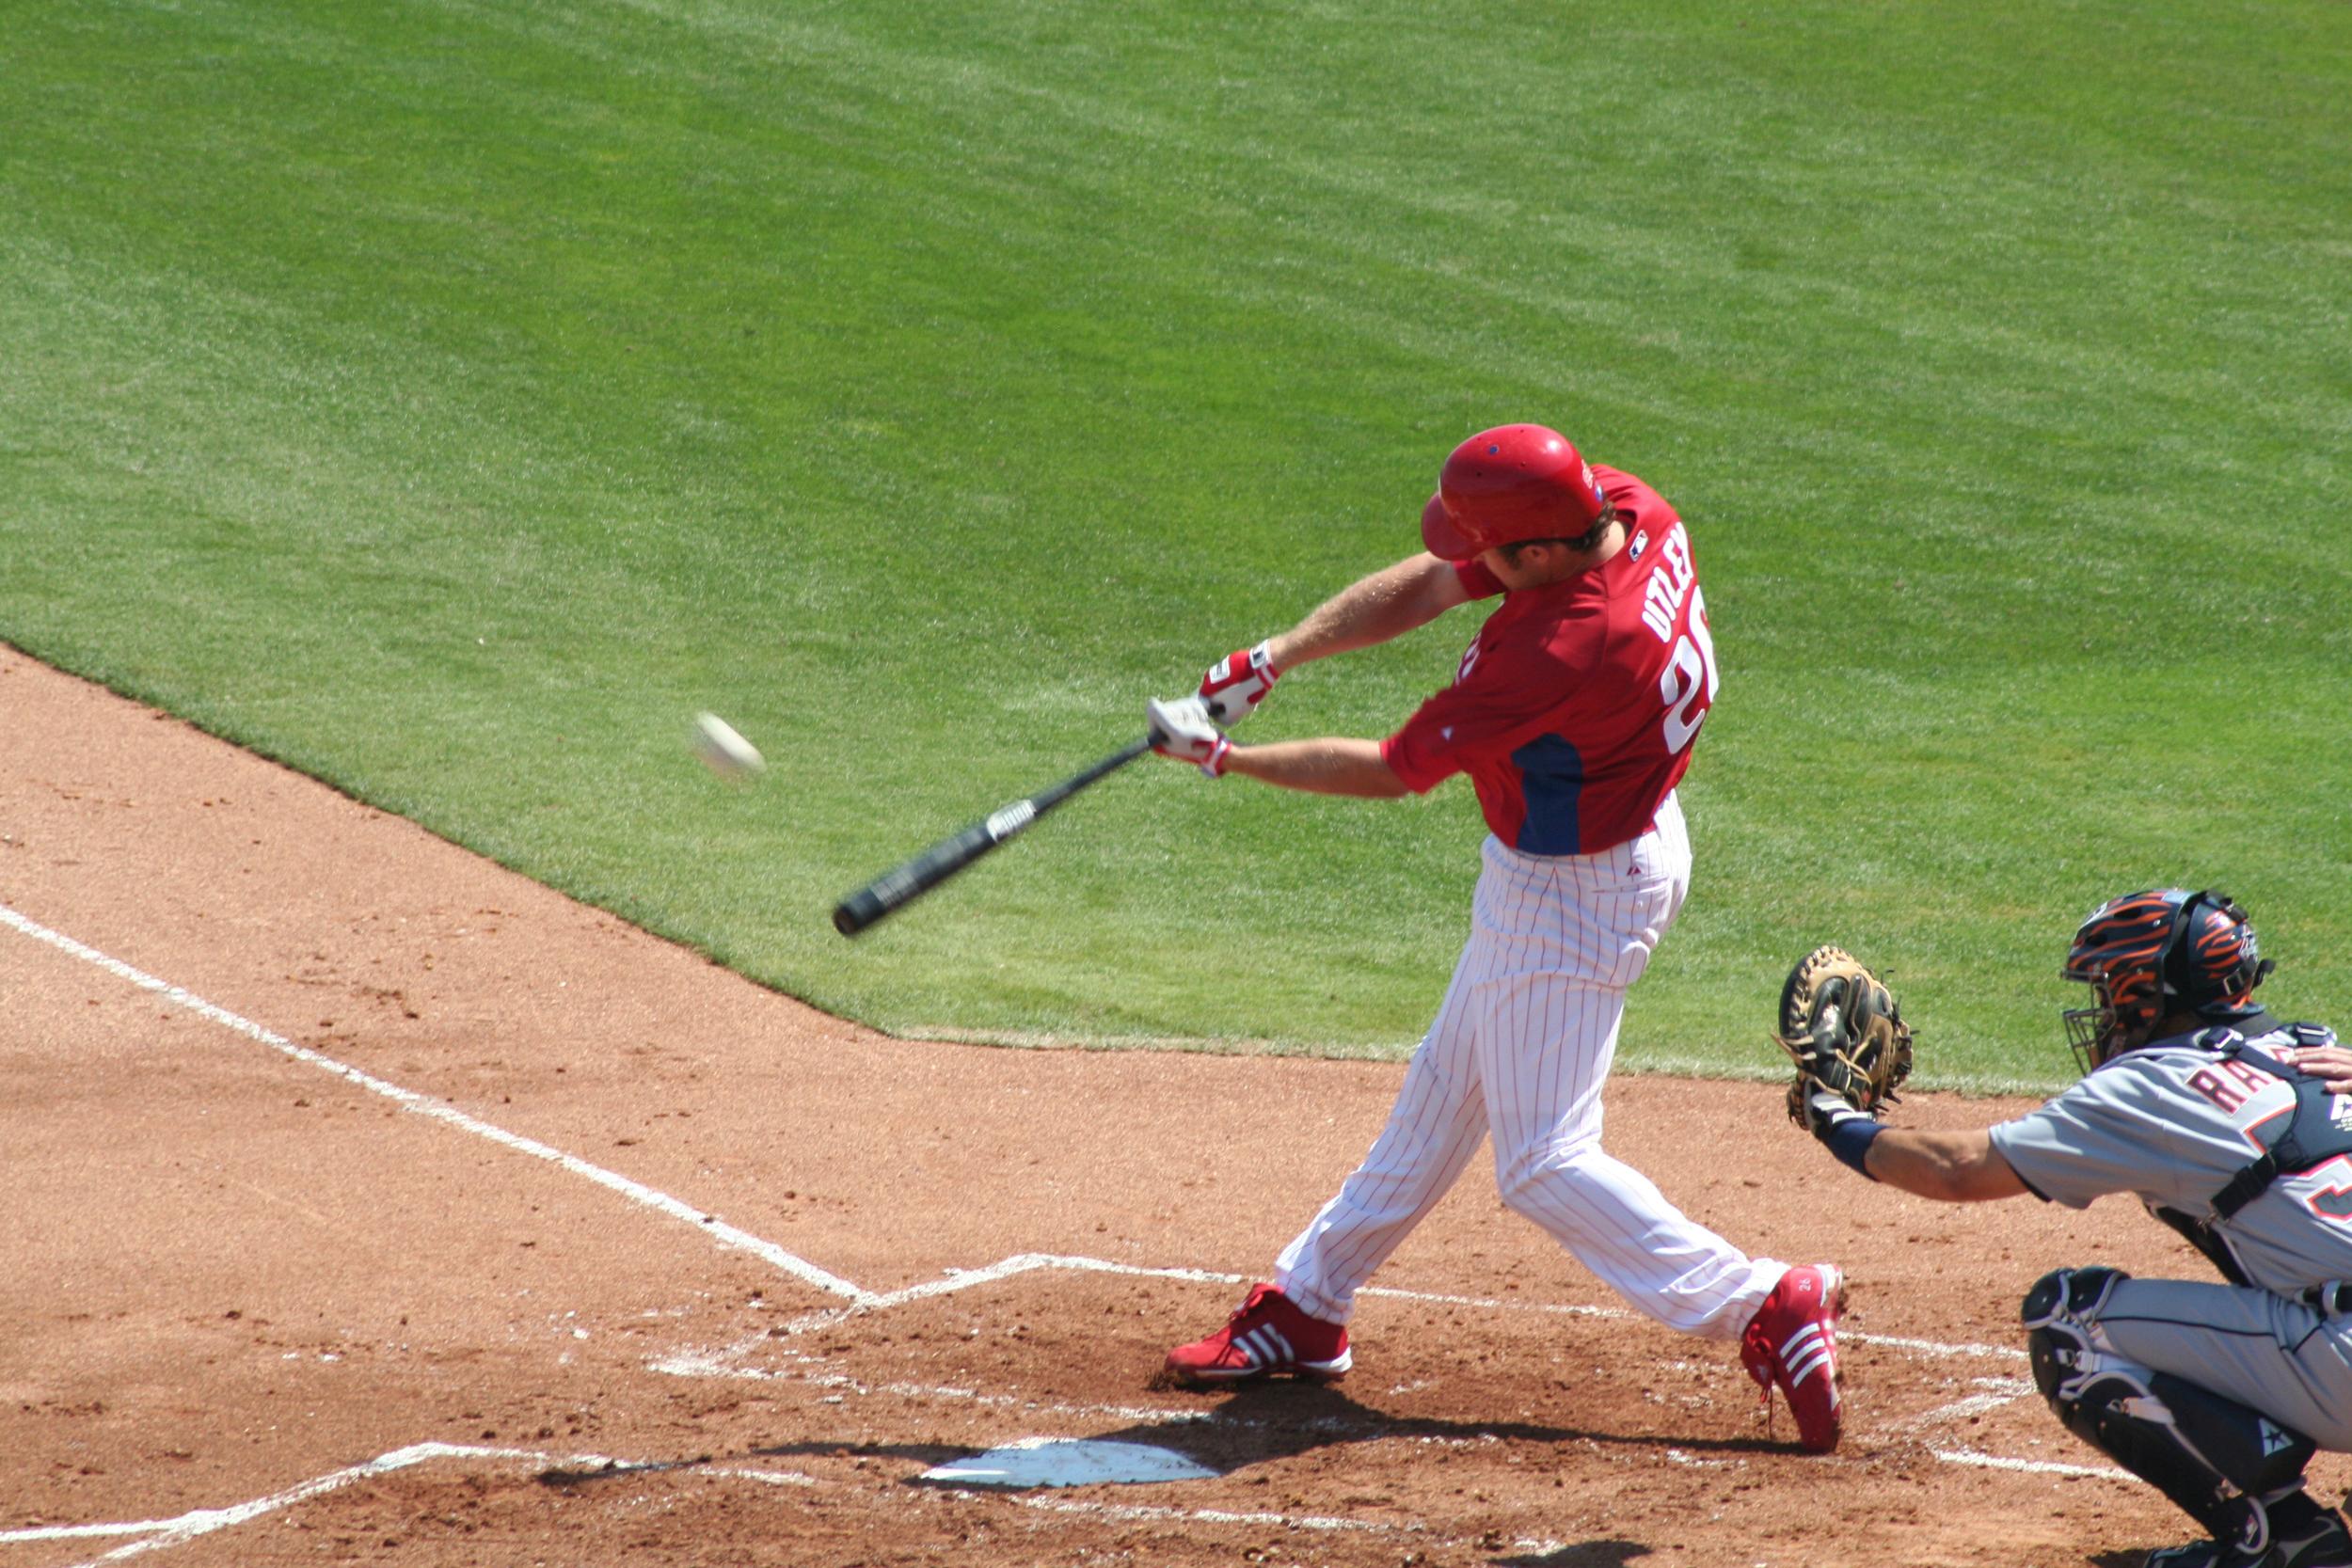 File:Chase Utley Home Run.jpg - Wikimedia Commons